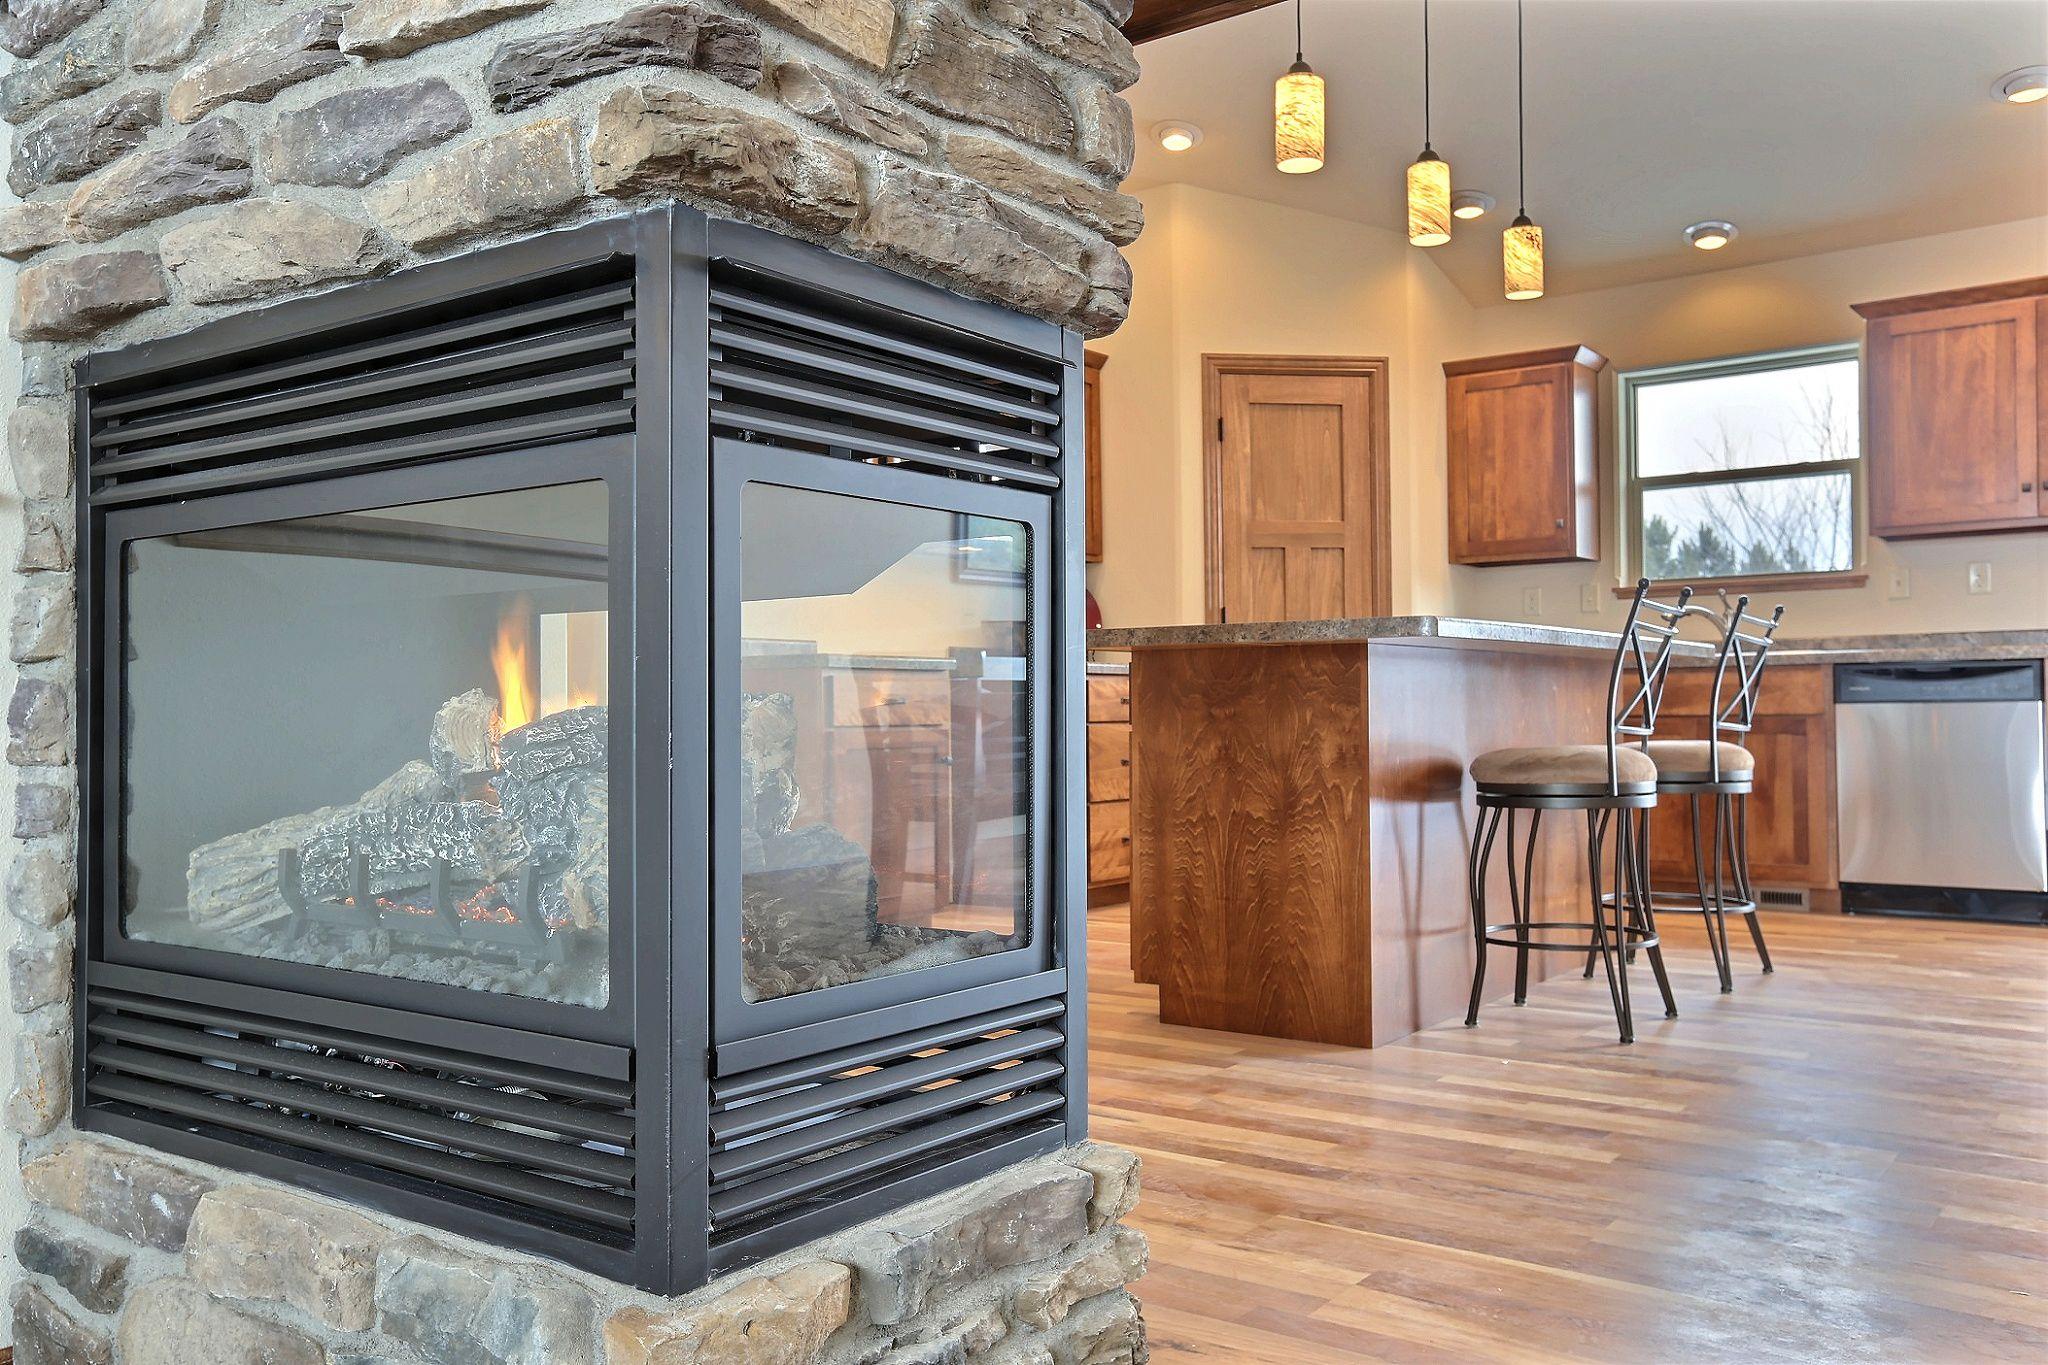 3 Sided Kingsman Fireplace Stone Ledgestone Pennsylvania